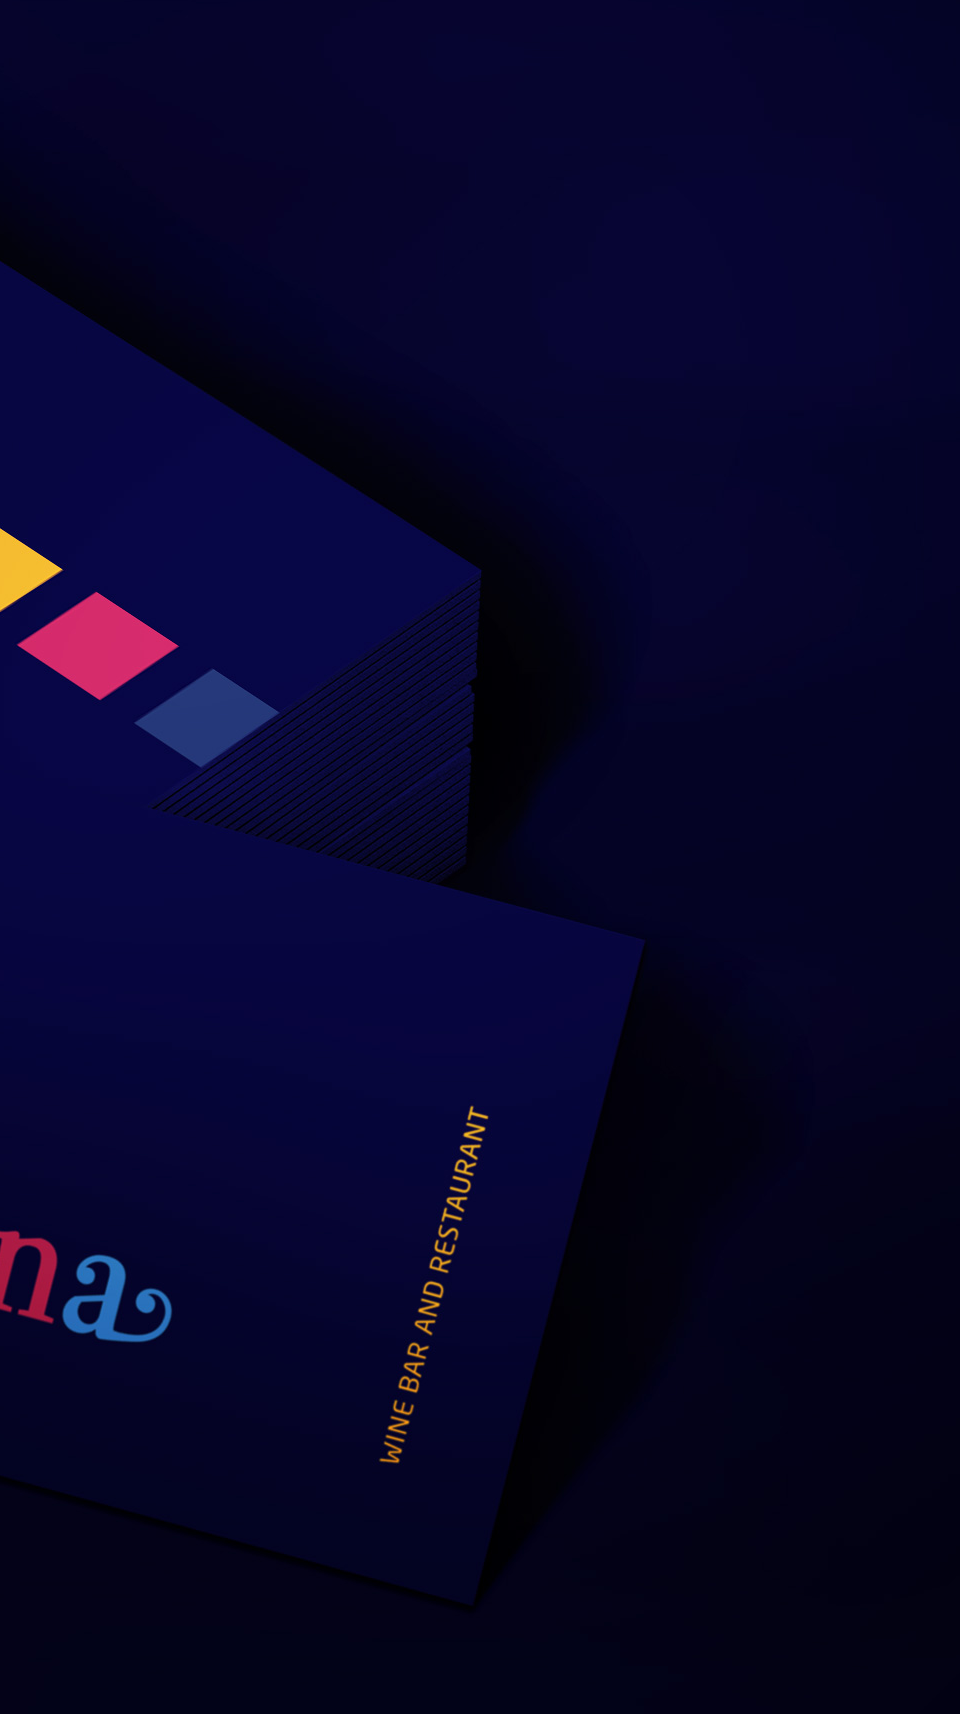 Barcelona_card_mockup Nik Hori Graphic Designer Sydney